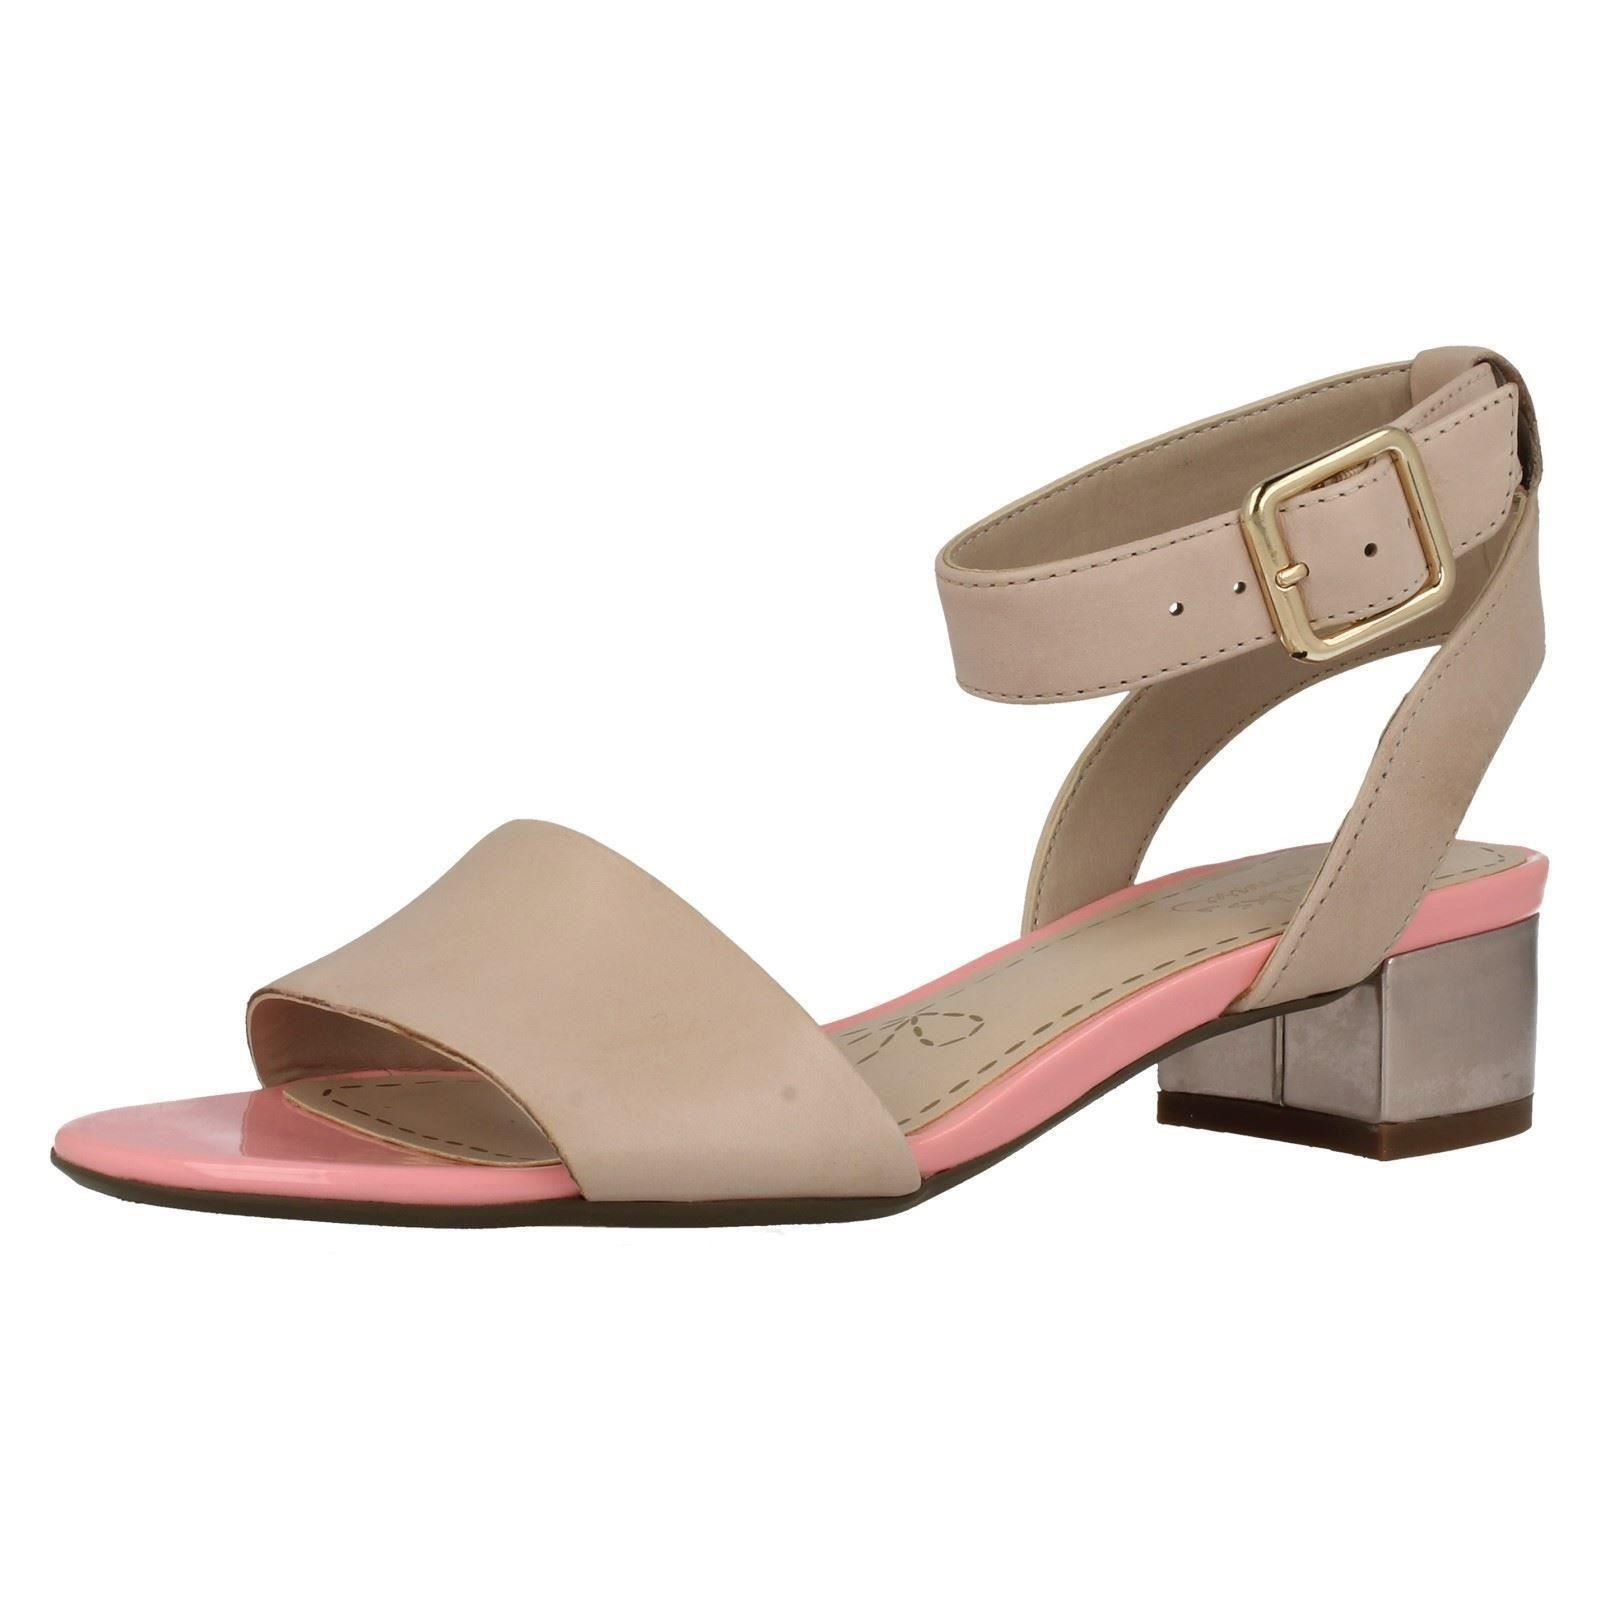 18c93c2c592c25 Clarks Ladies Sandals Sharna Balcony Oyster 3 UK D